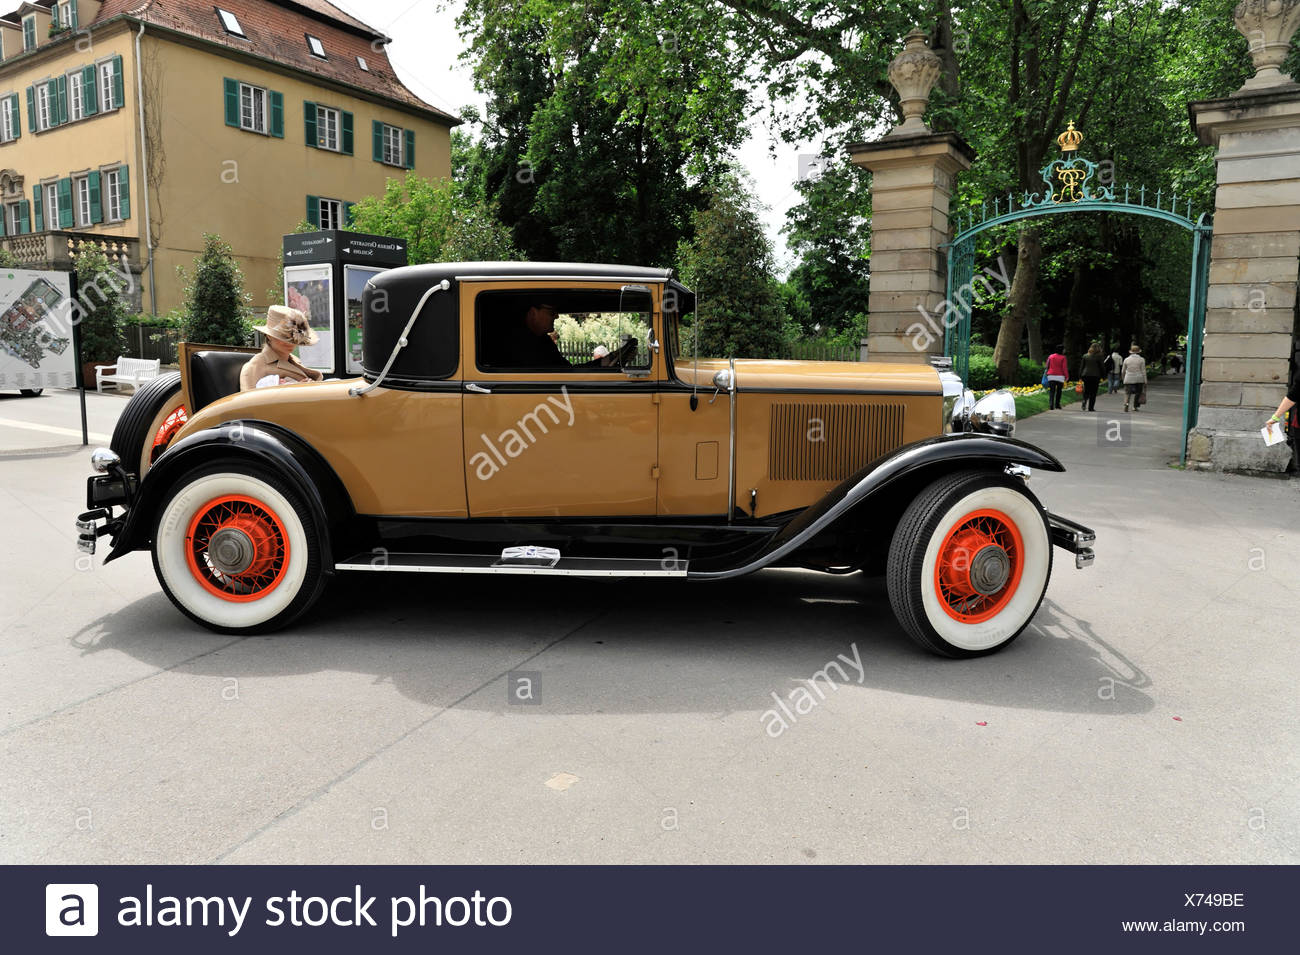 buick serie 64 c country club coupe, baujahr 1930, oldtimer, retro